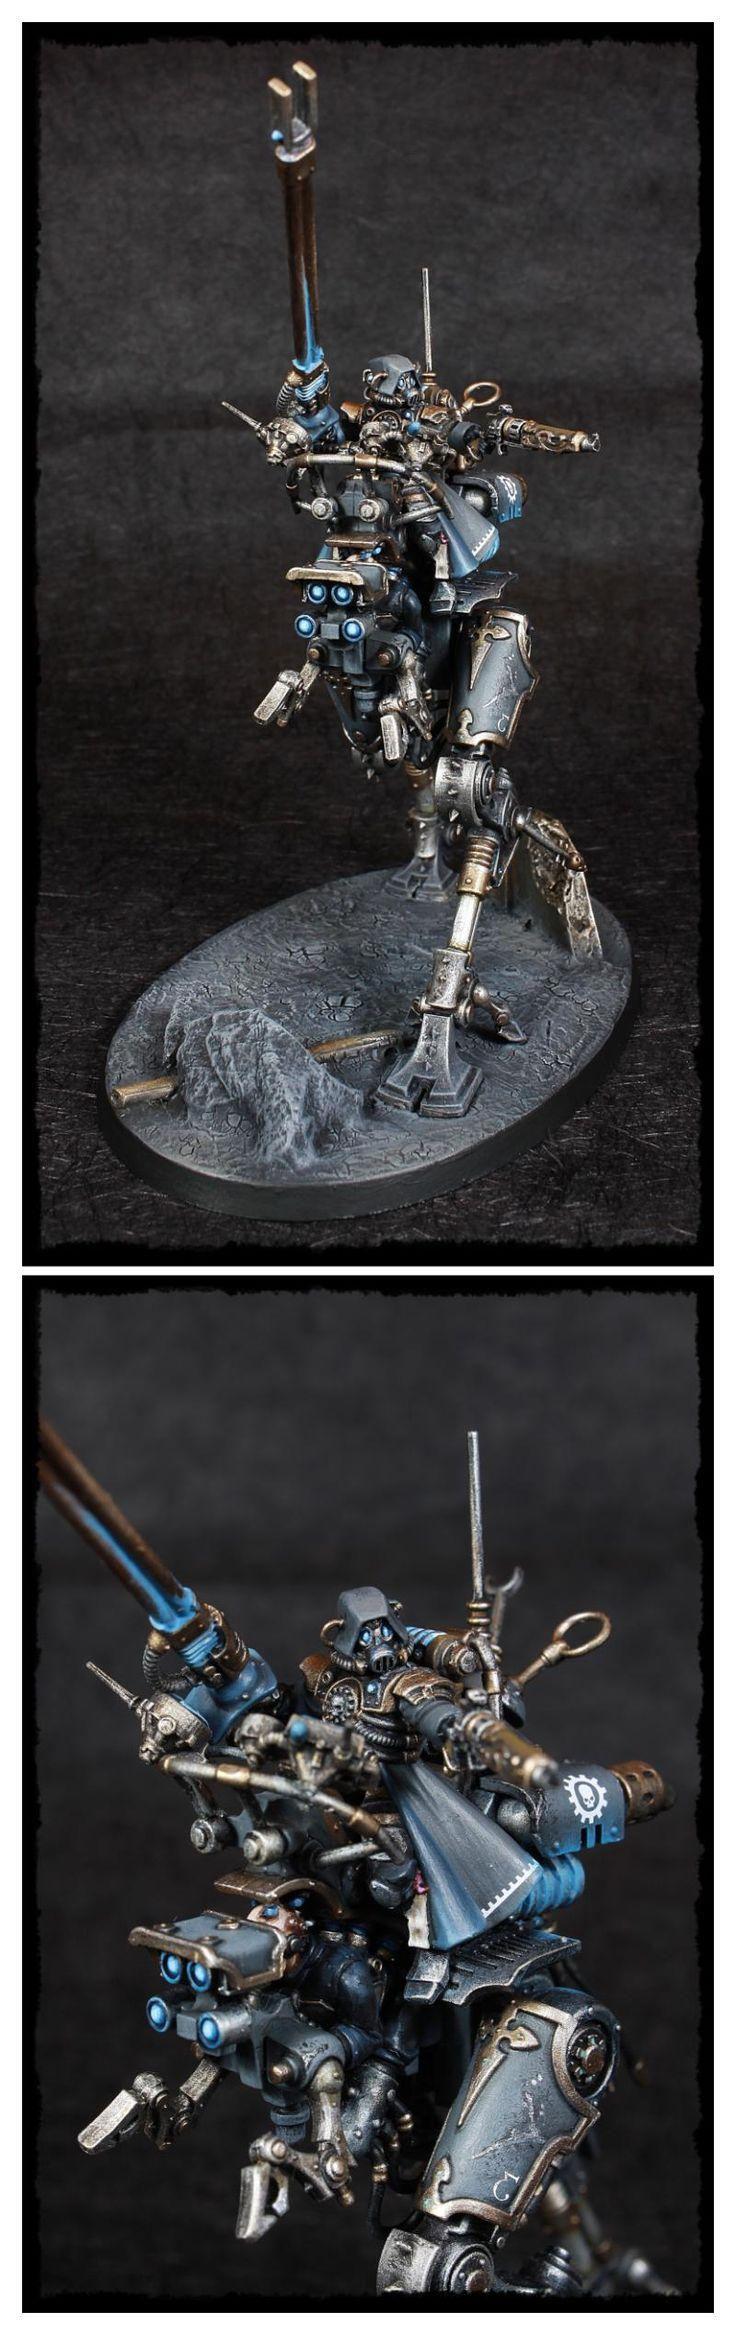 Achlys Tertius, Adeptus Mechanicus, Admech, Ironstrider, Skitarii, Sydonian Dragoon, Warhammer 40,000